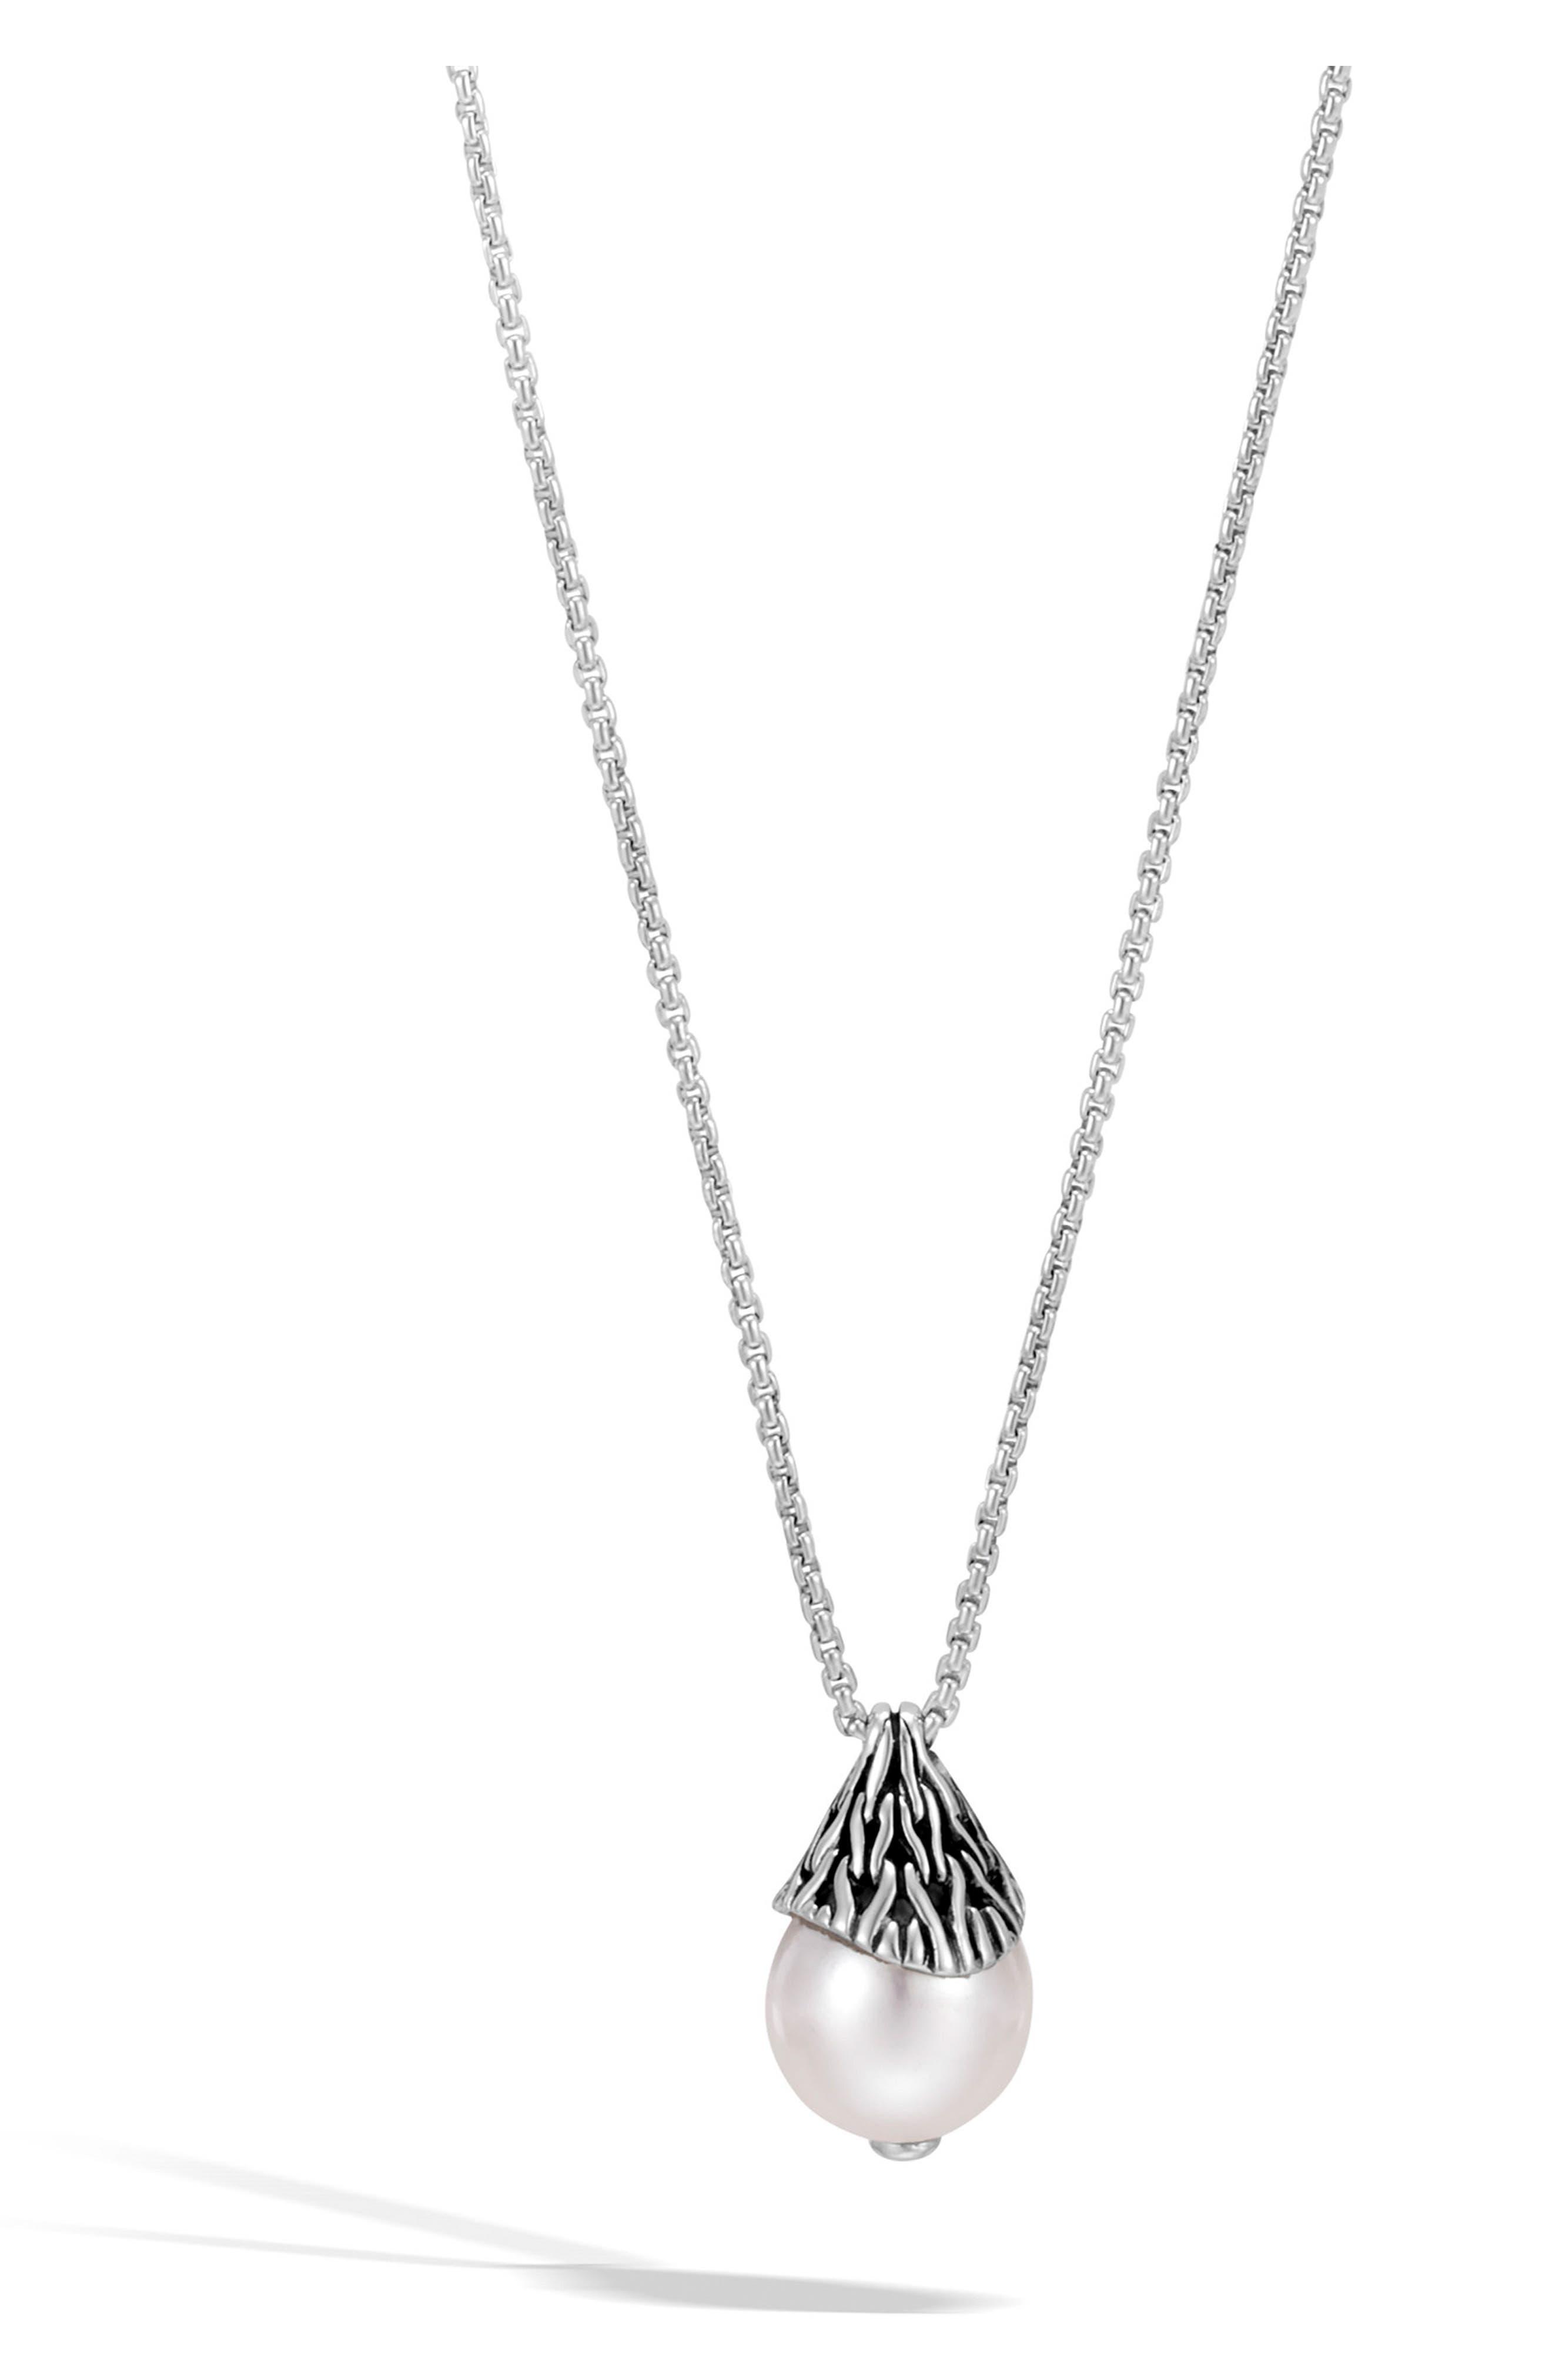 Main Image - John Hardy Classic Chain Pendant Necklace